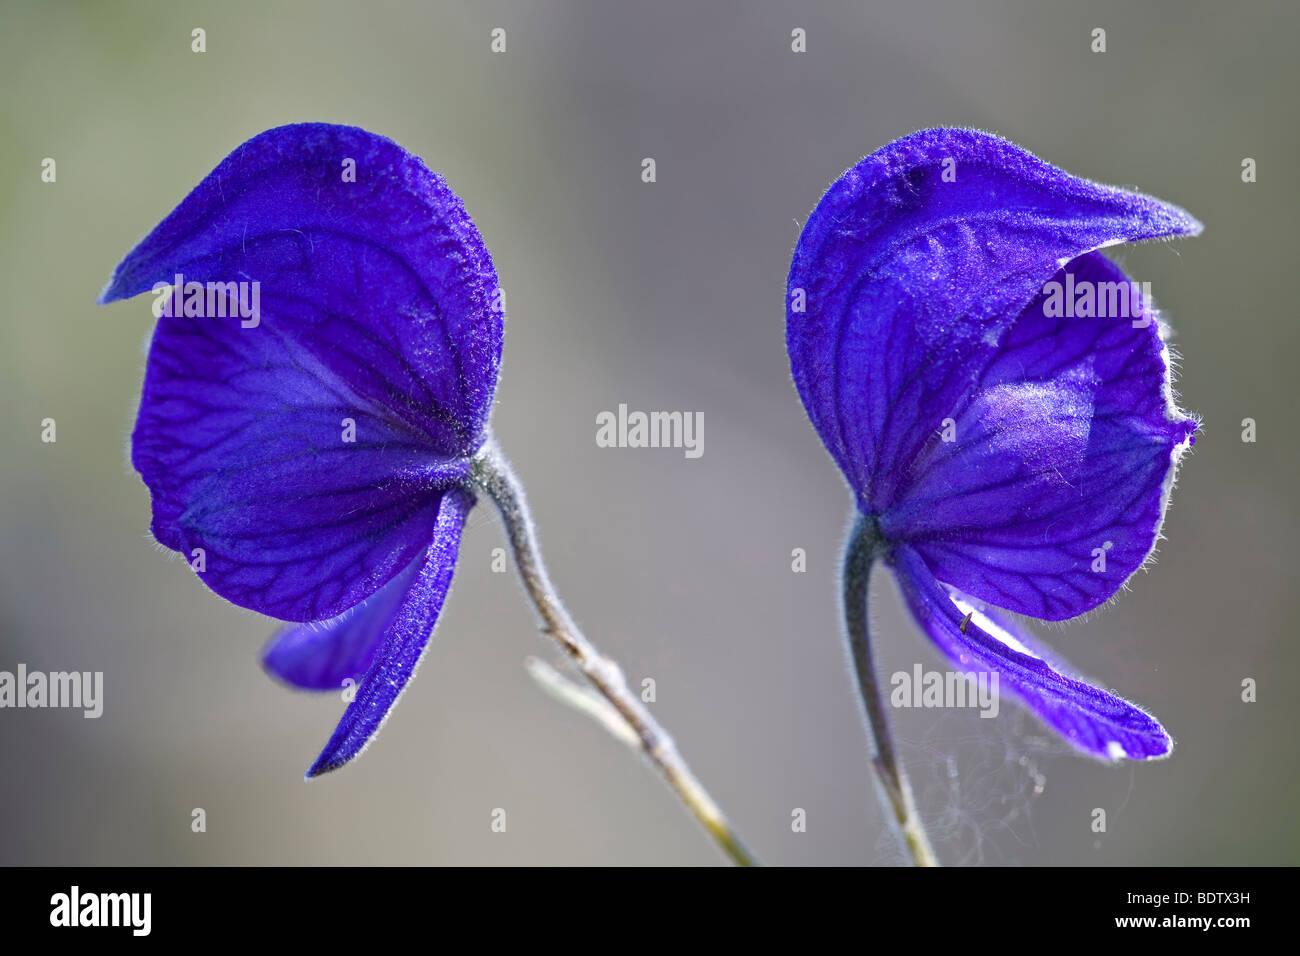 Eisenhut - (Dt.Name unbekannt) / Larkspurleaf Monkshood / Aconitum delphiniifolium - Stock Image